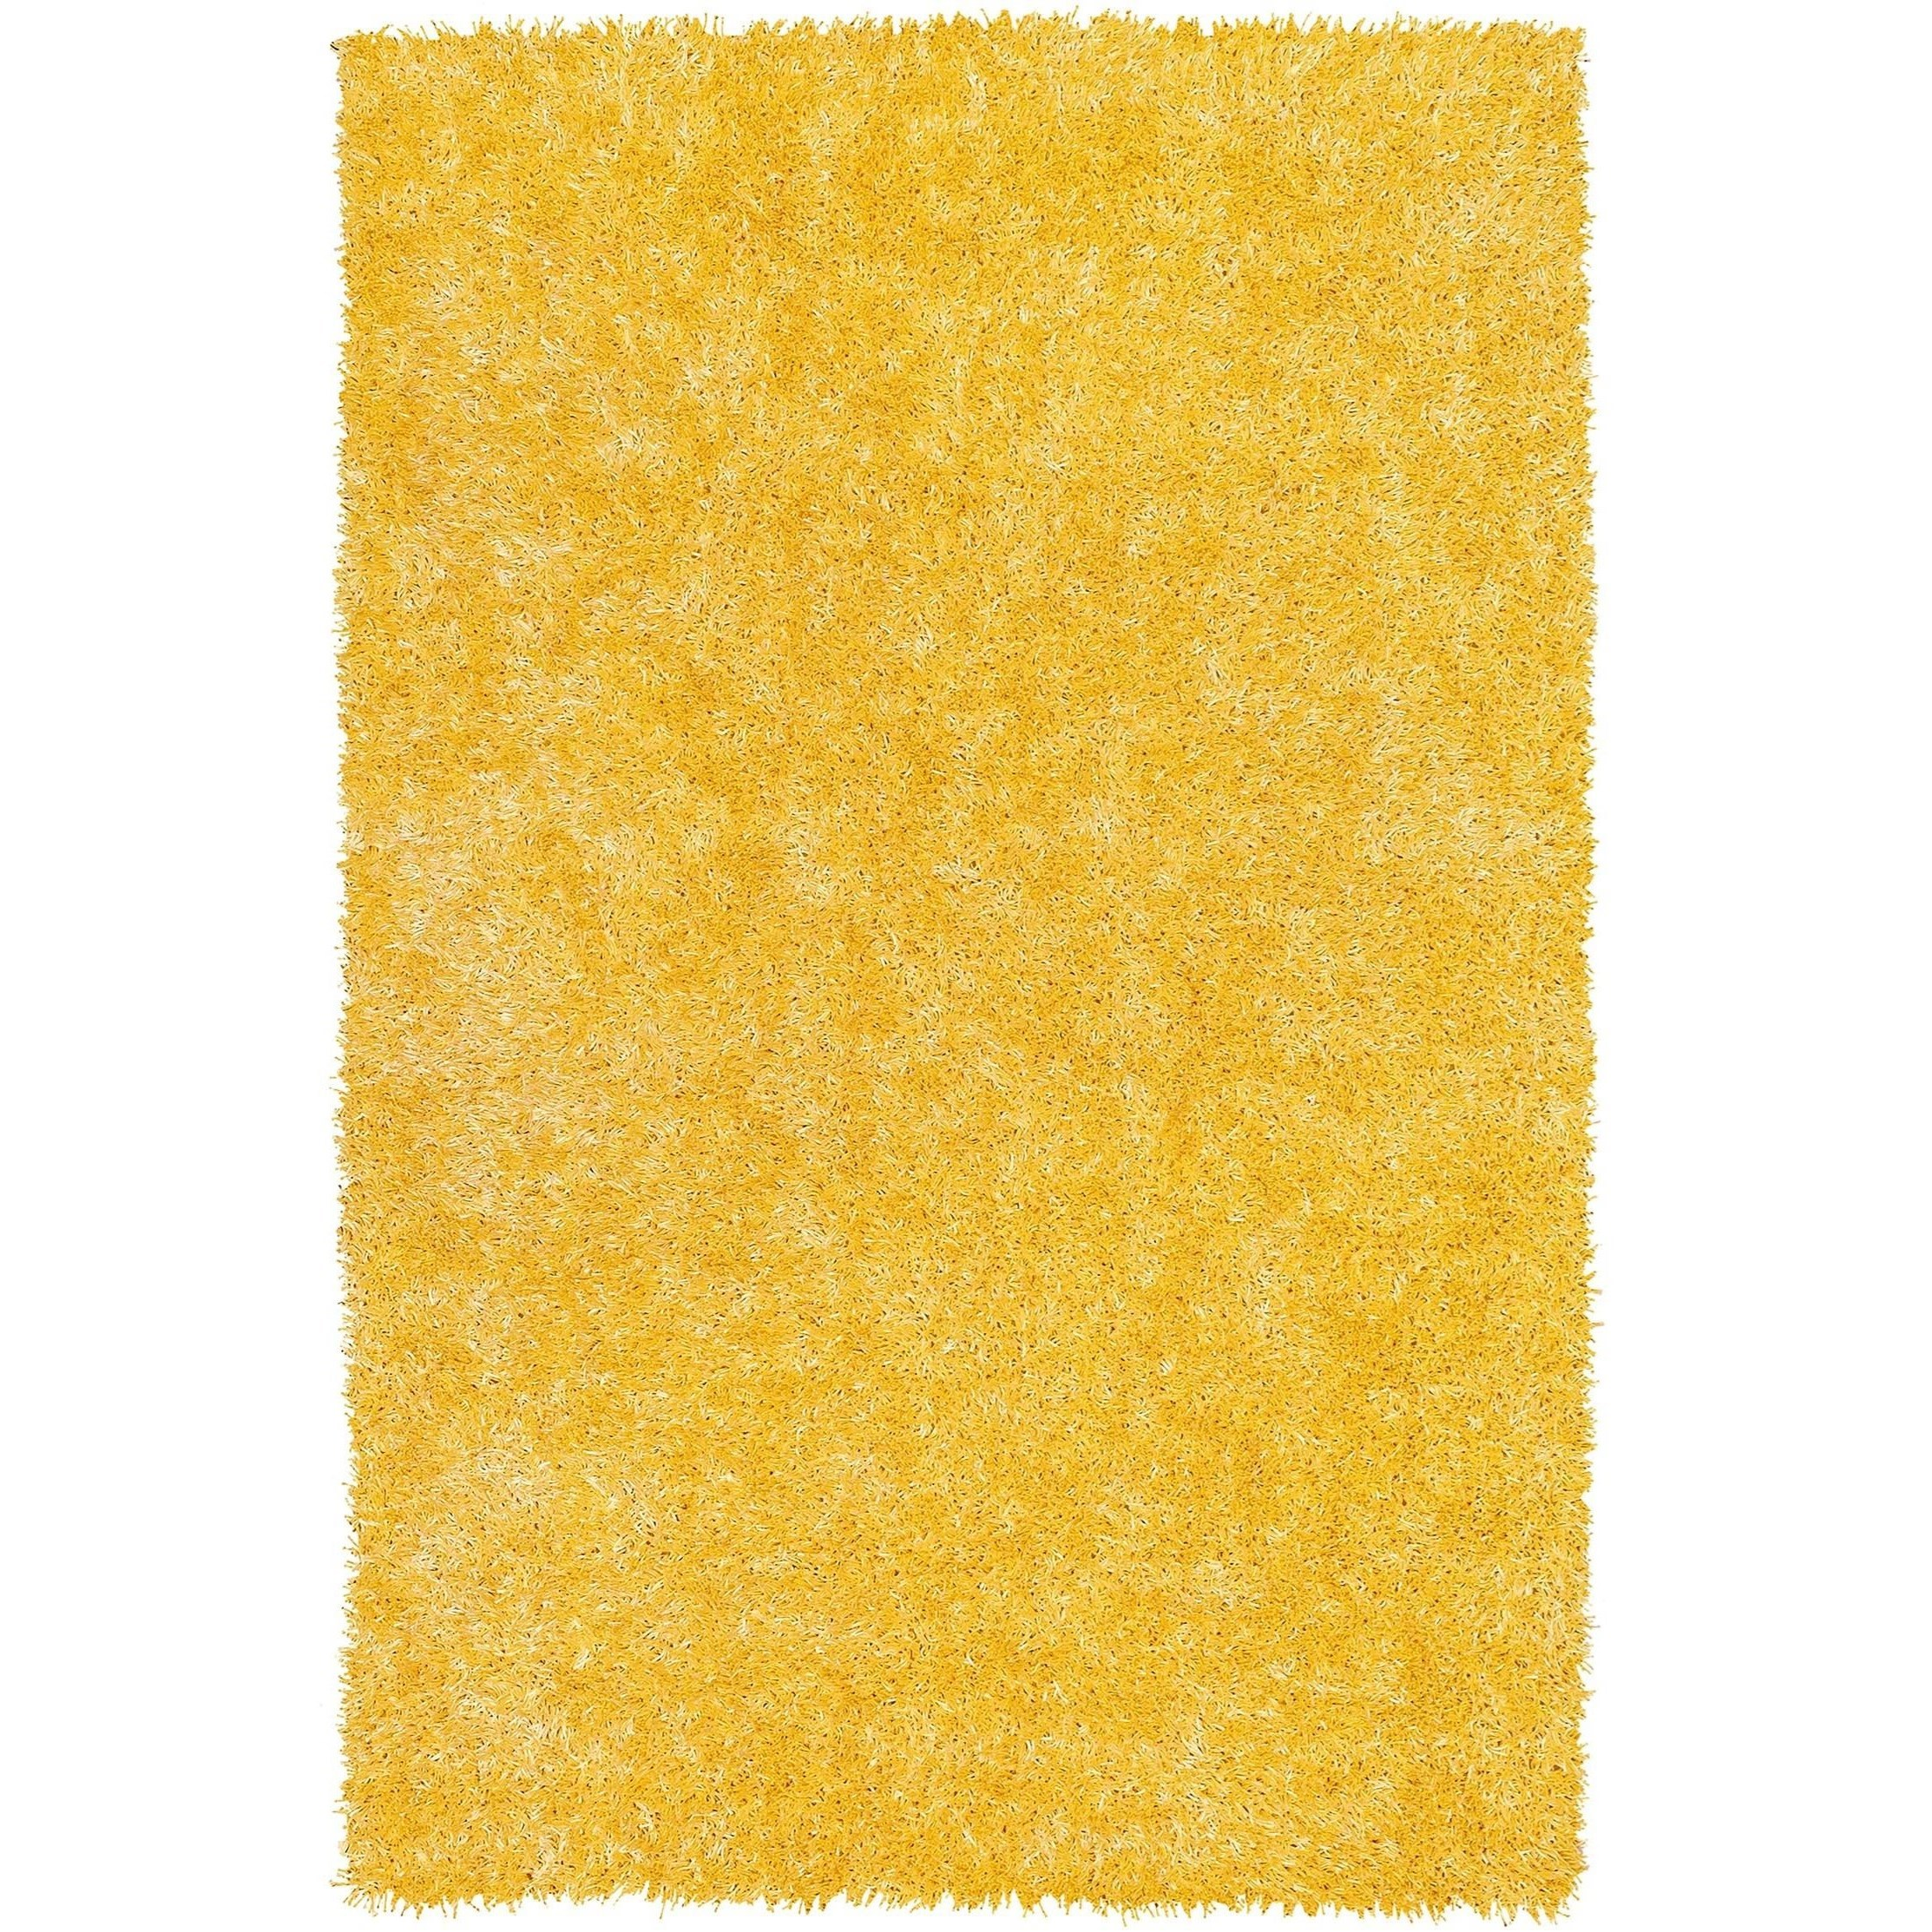 Dalyn Bright Lights Lemon 8'X10' Rug - Item Number: BG69LE8X10